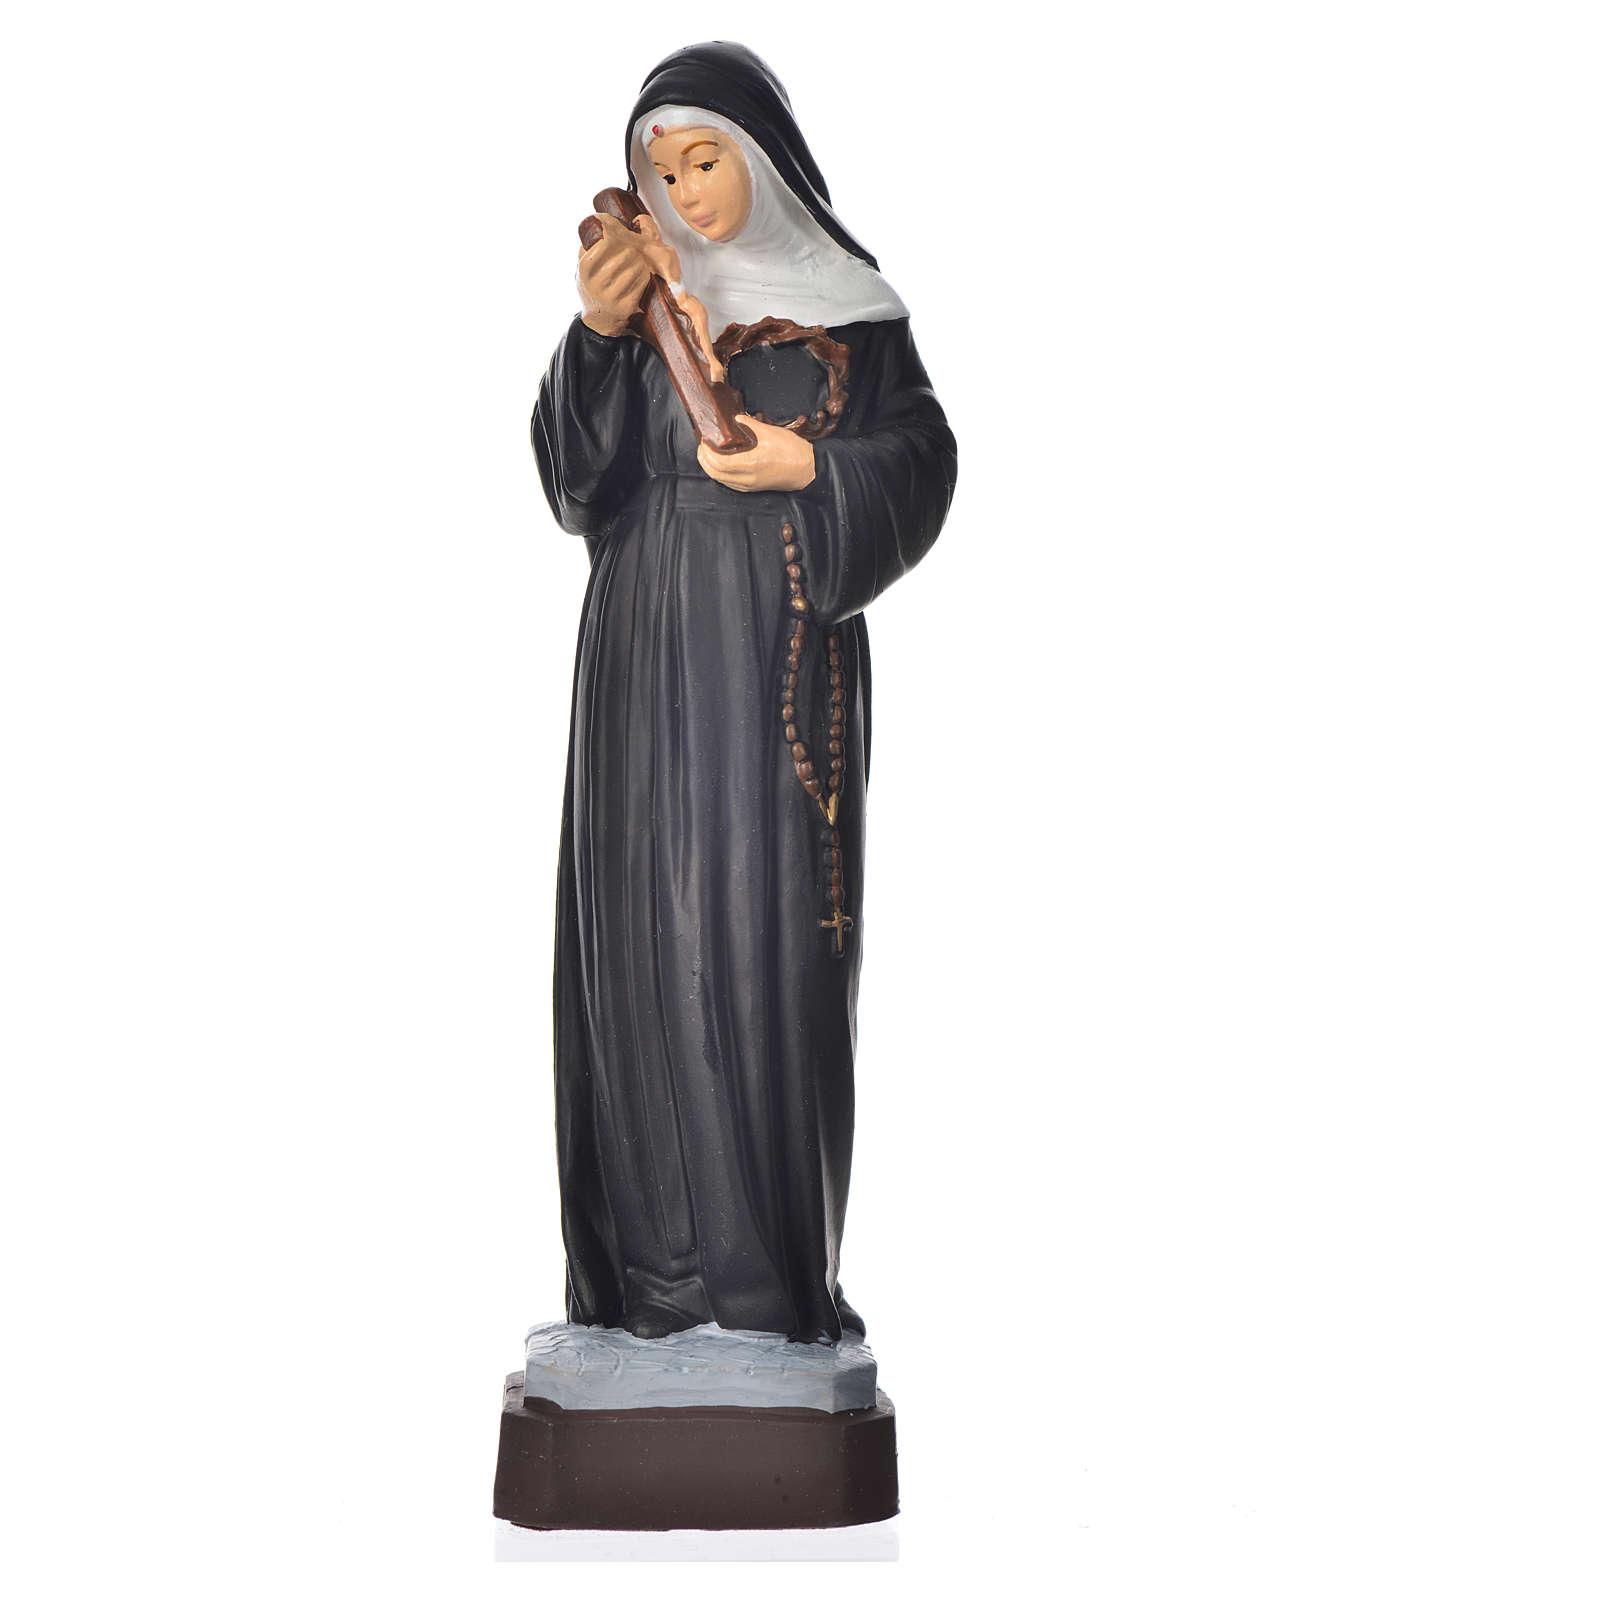 Saint Rita 16cm, unbreakable material 4